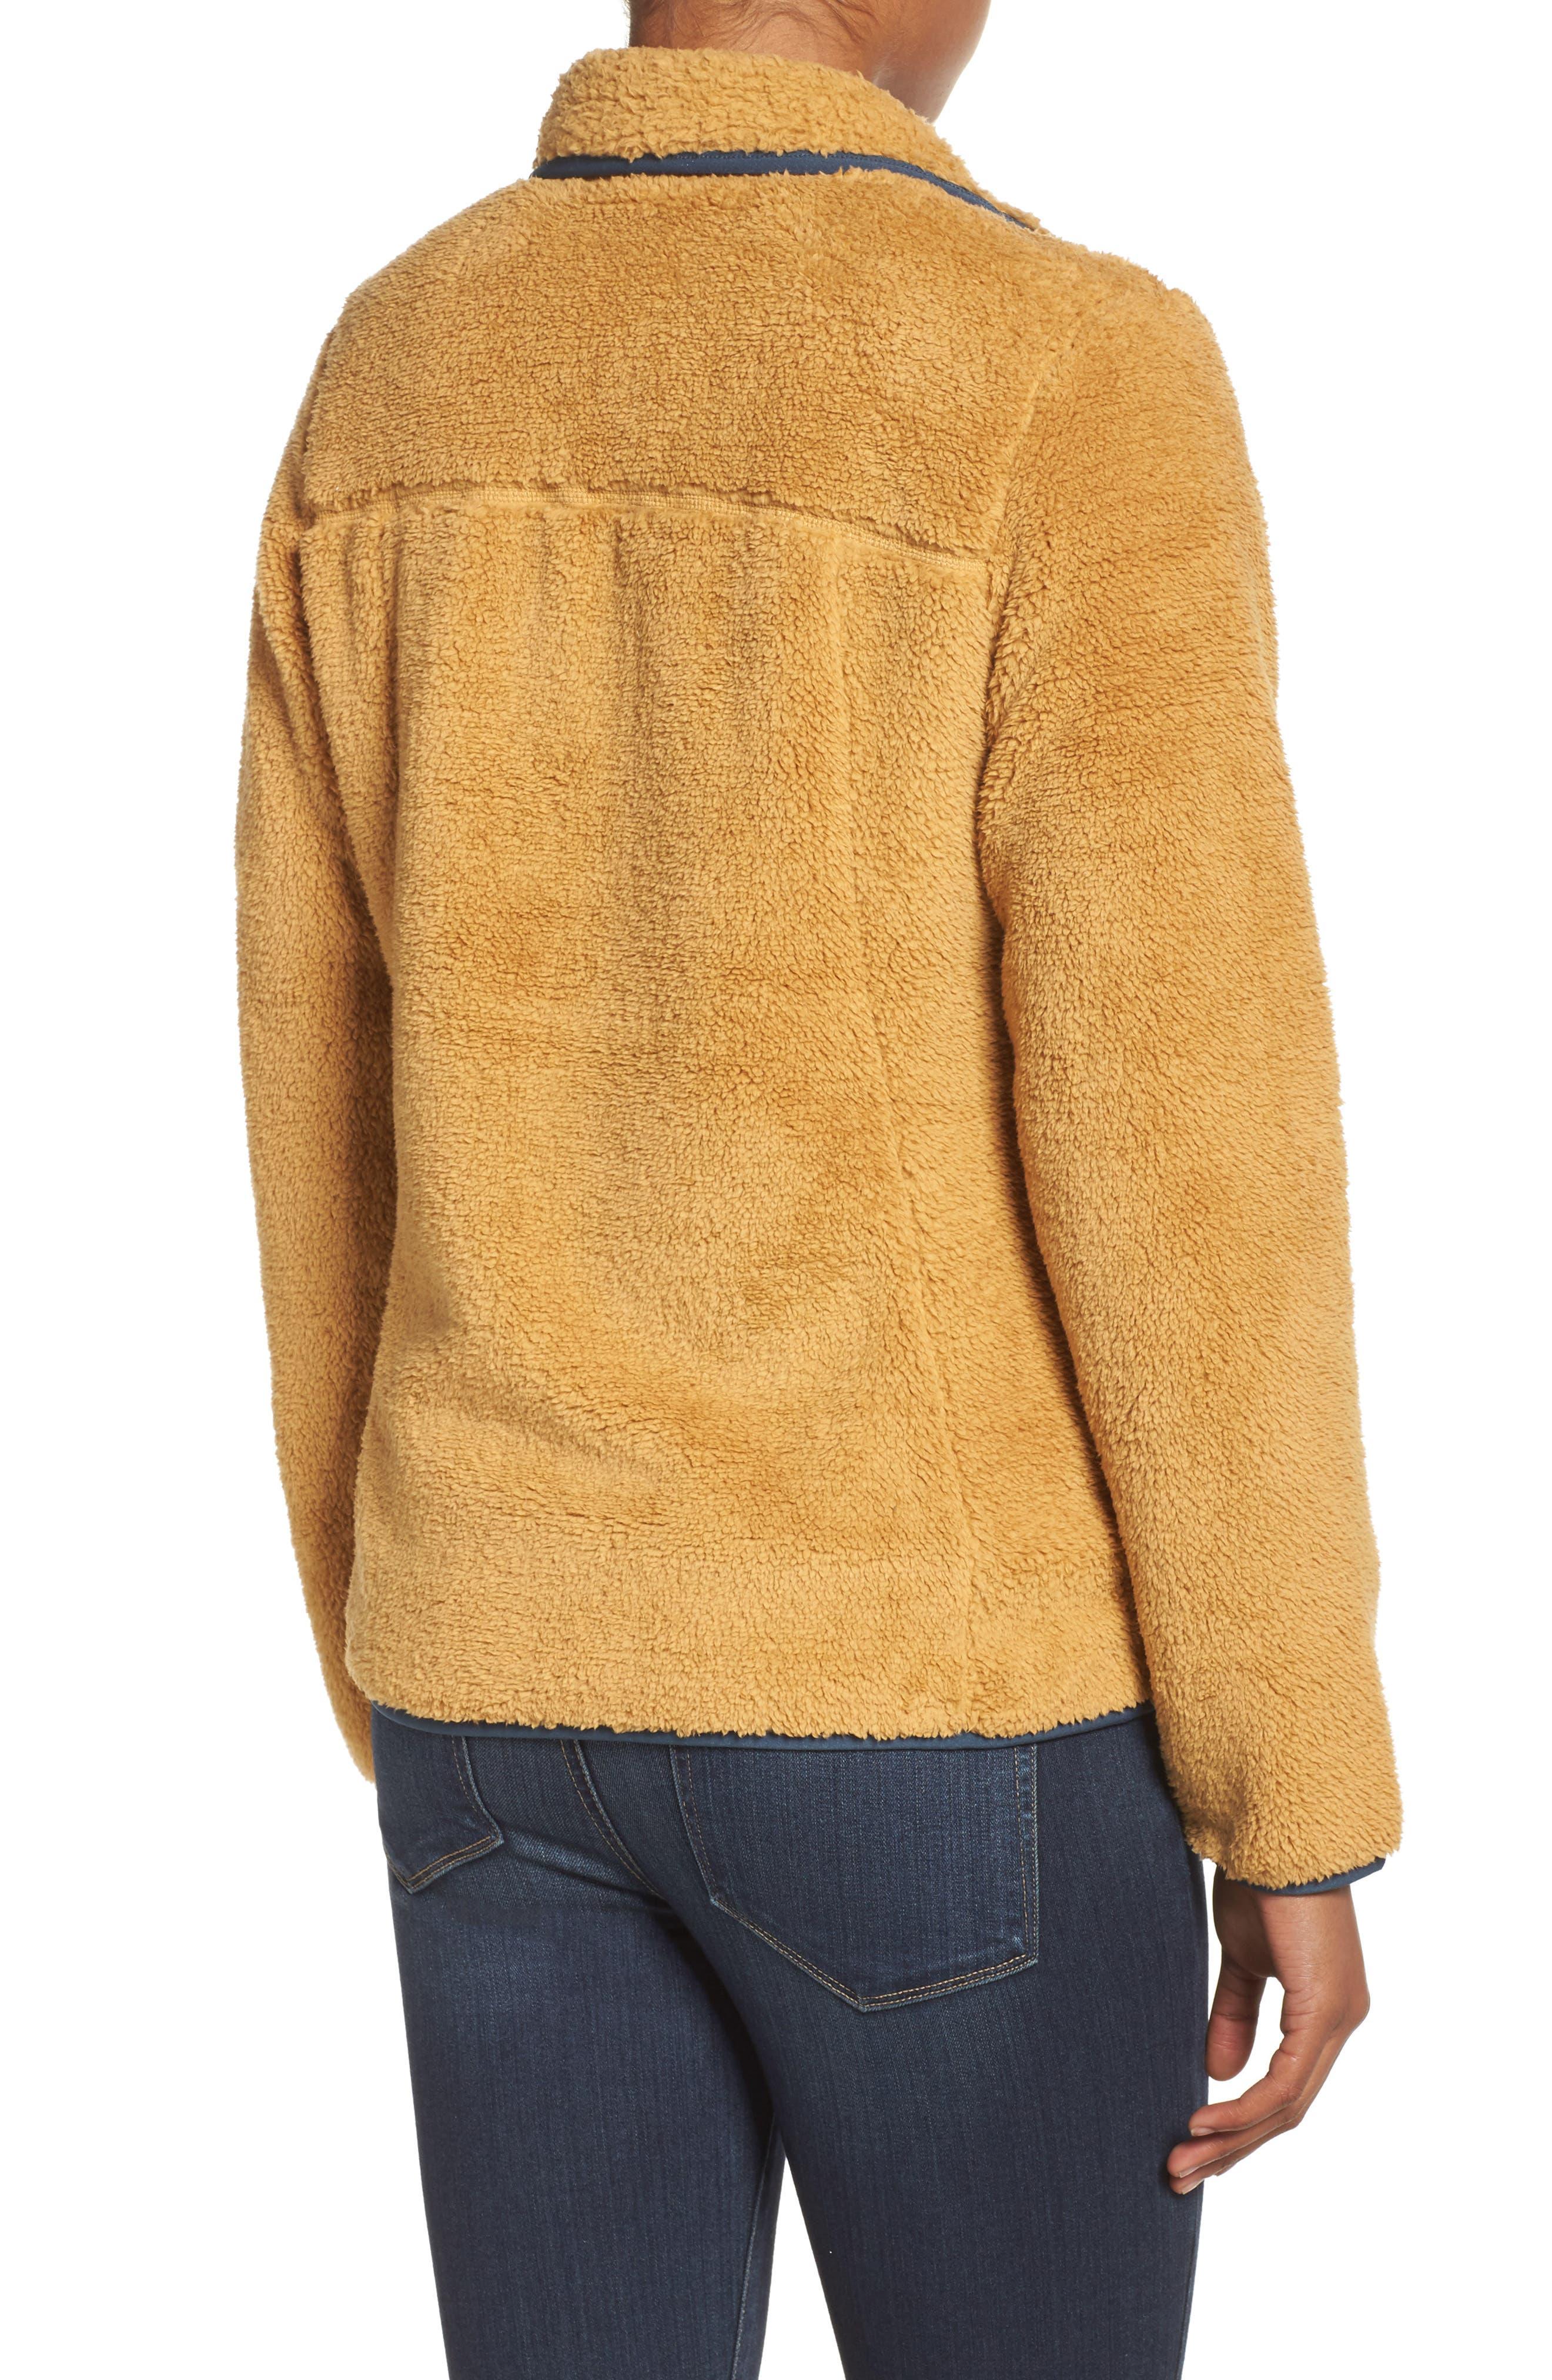 Campshire Zip Jacket,                             Alternate thumbnail 2, color,                             Biscuit Tan